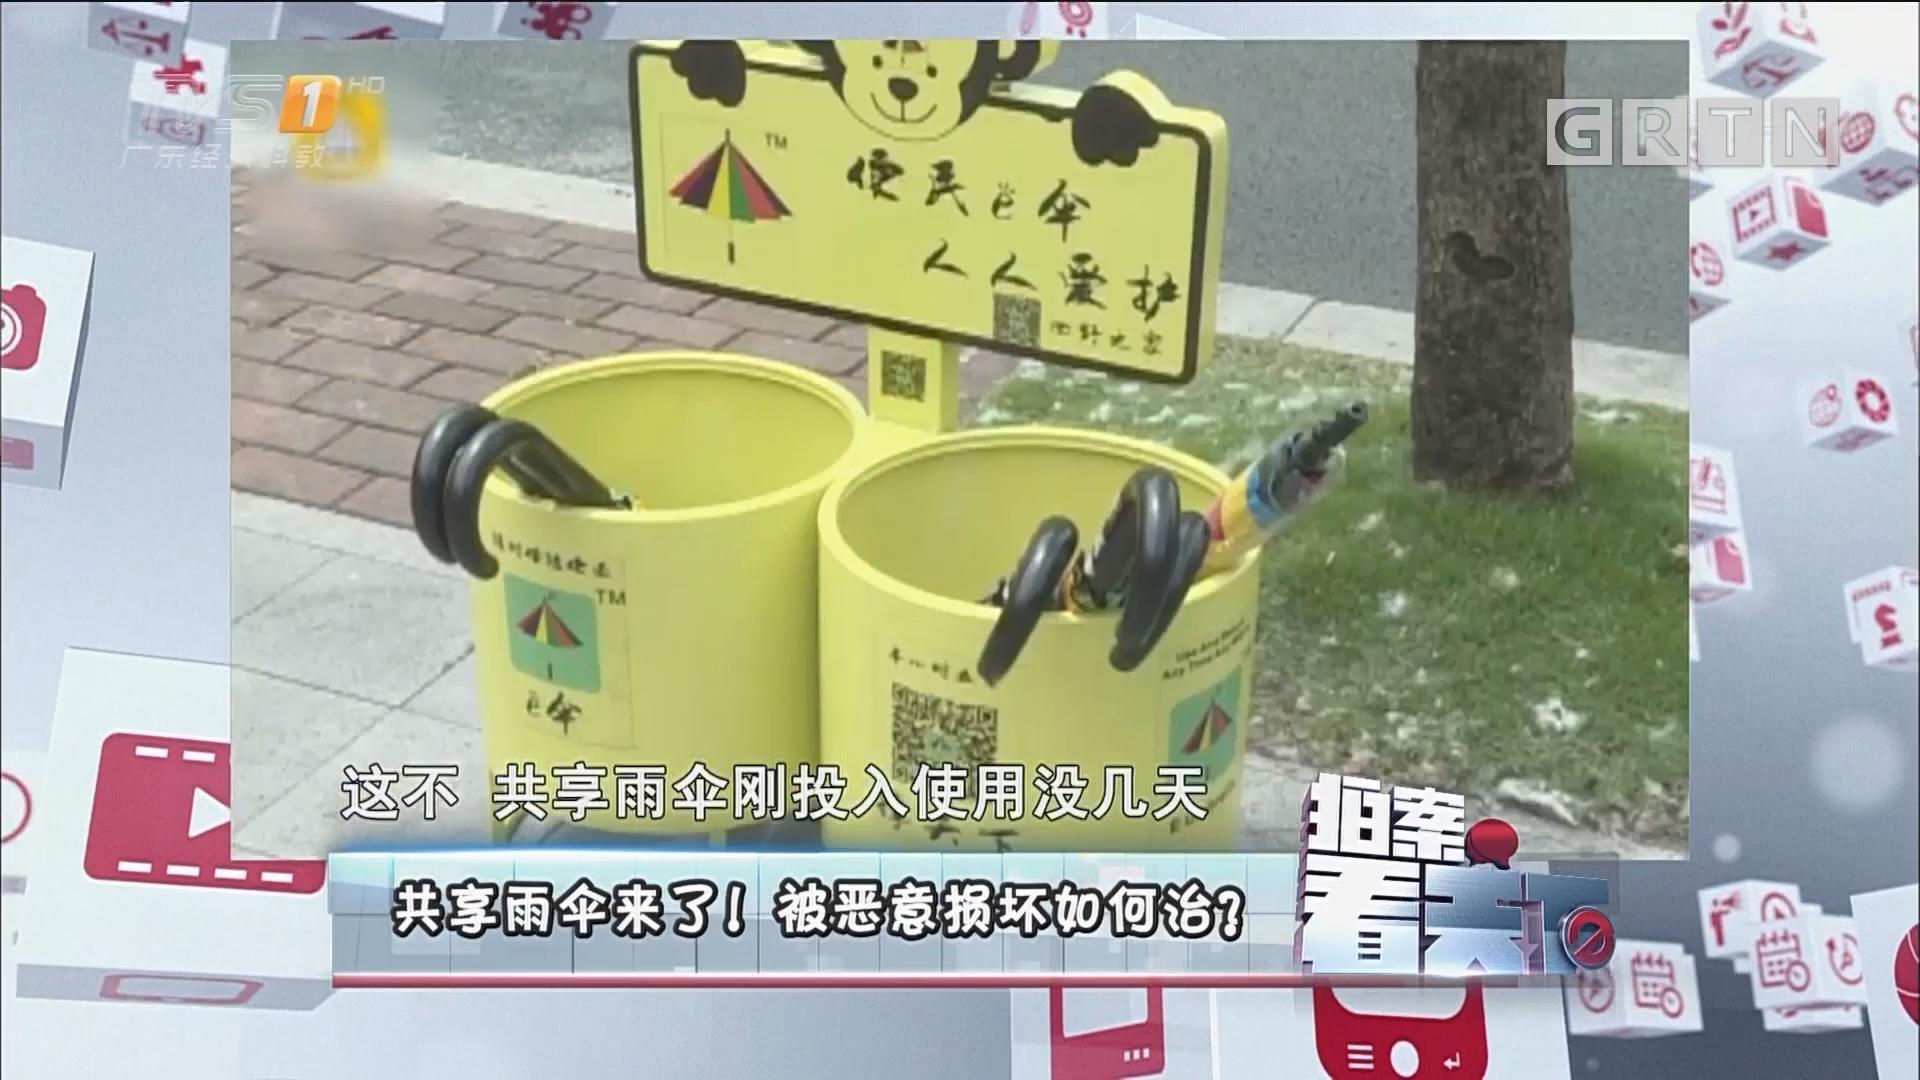 [HD][2017-05-26]拍案看天下:共享雨伞来了!被恶意损坏如何治?